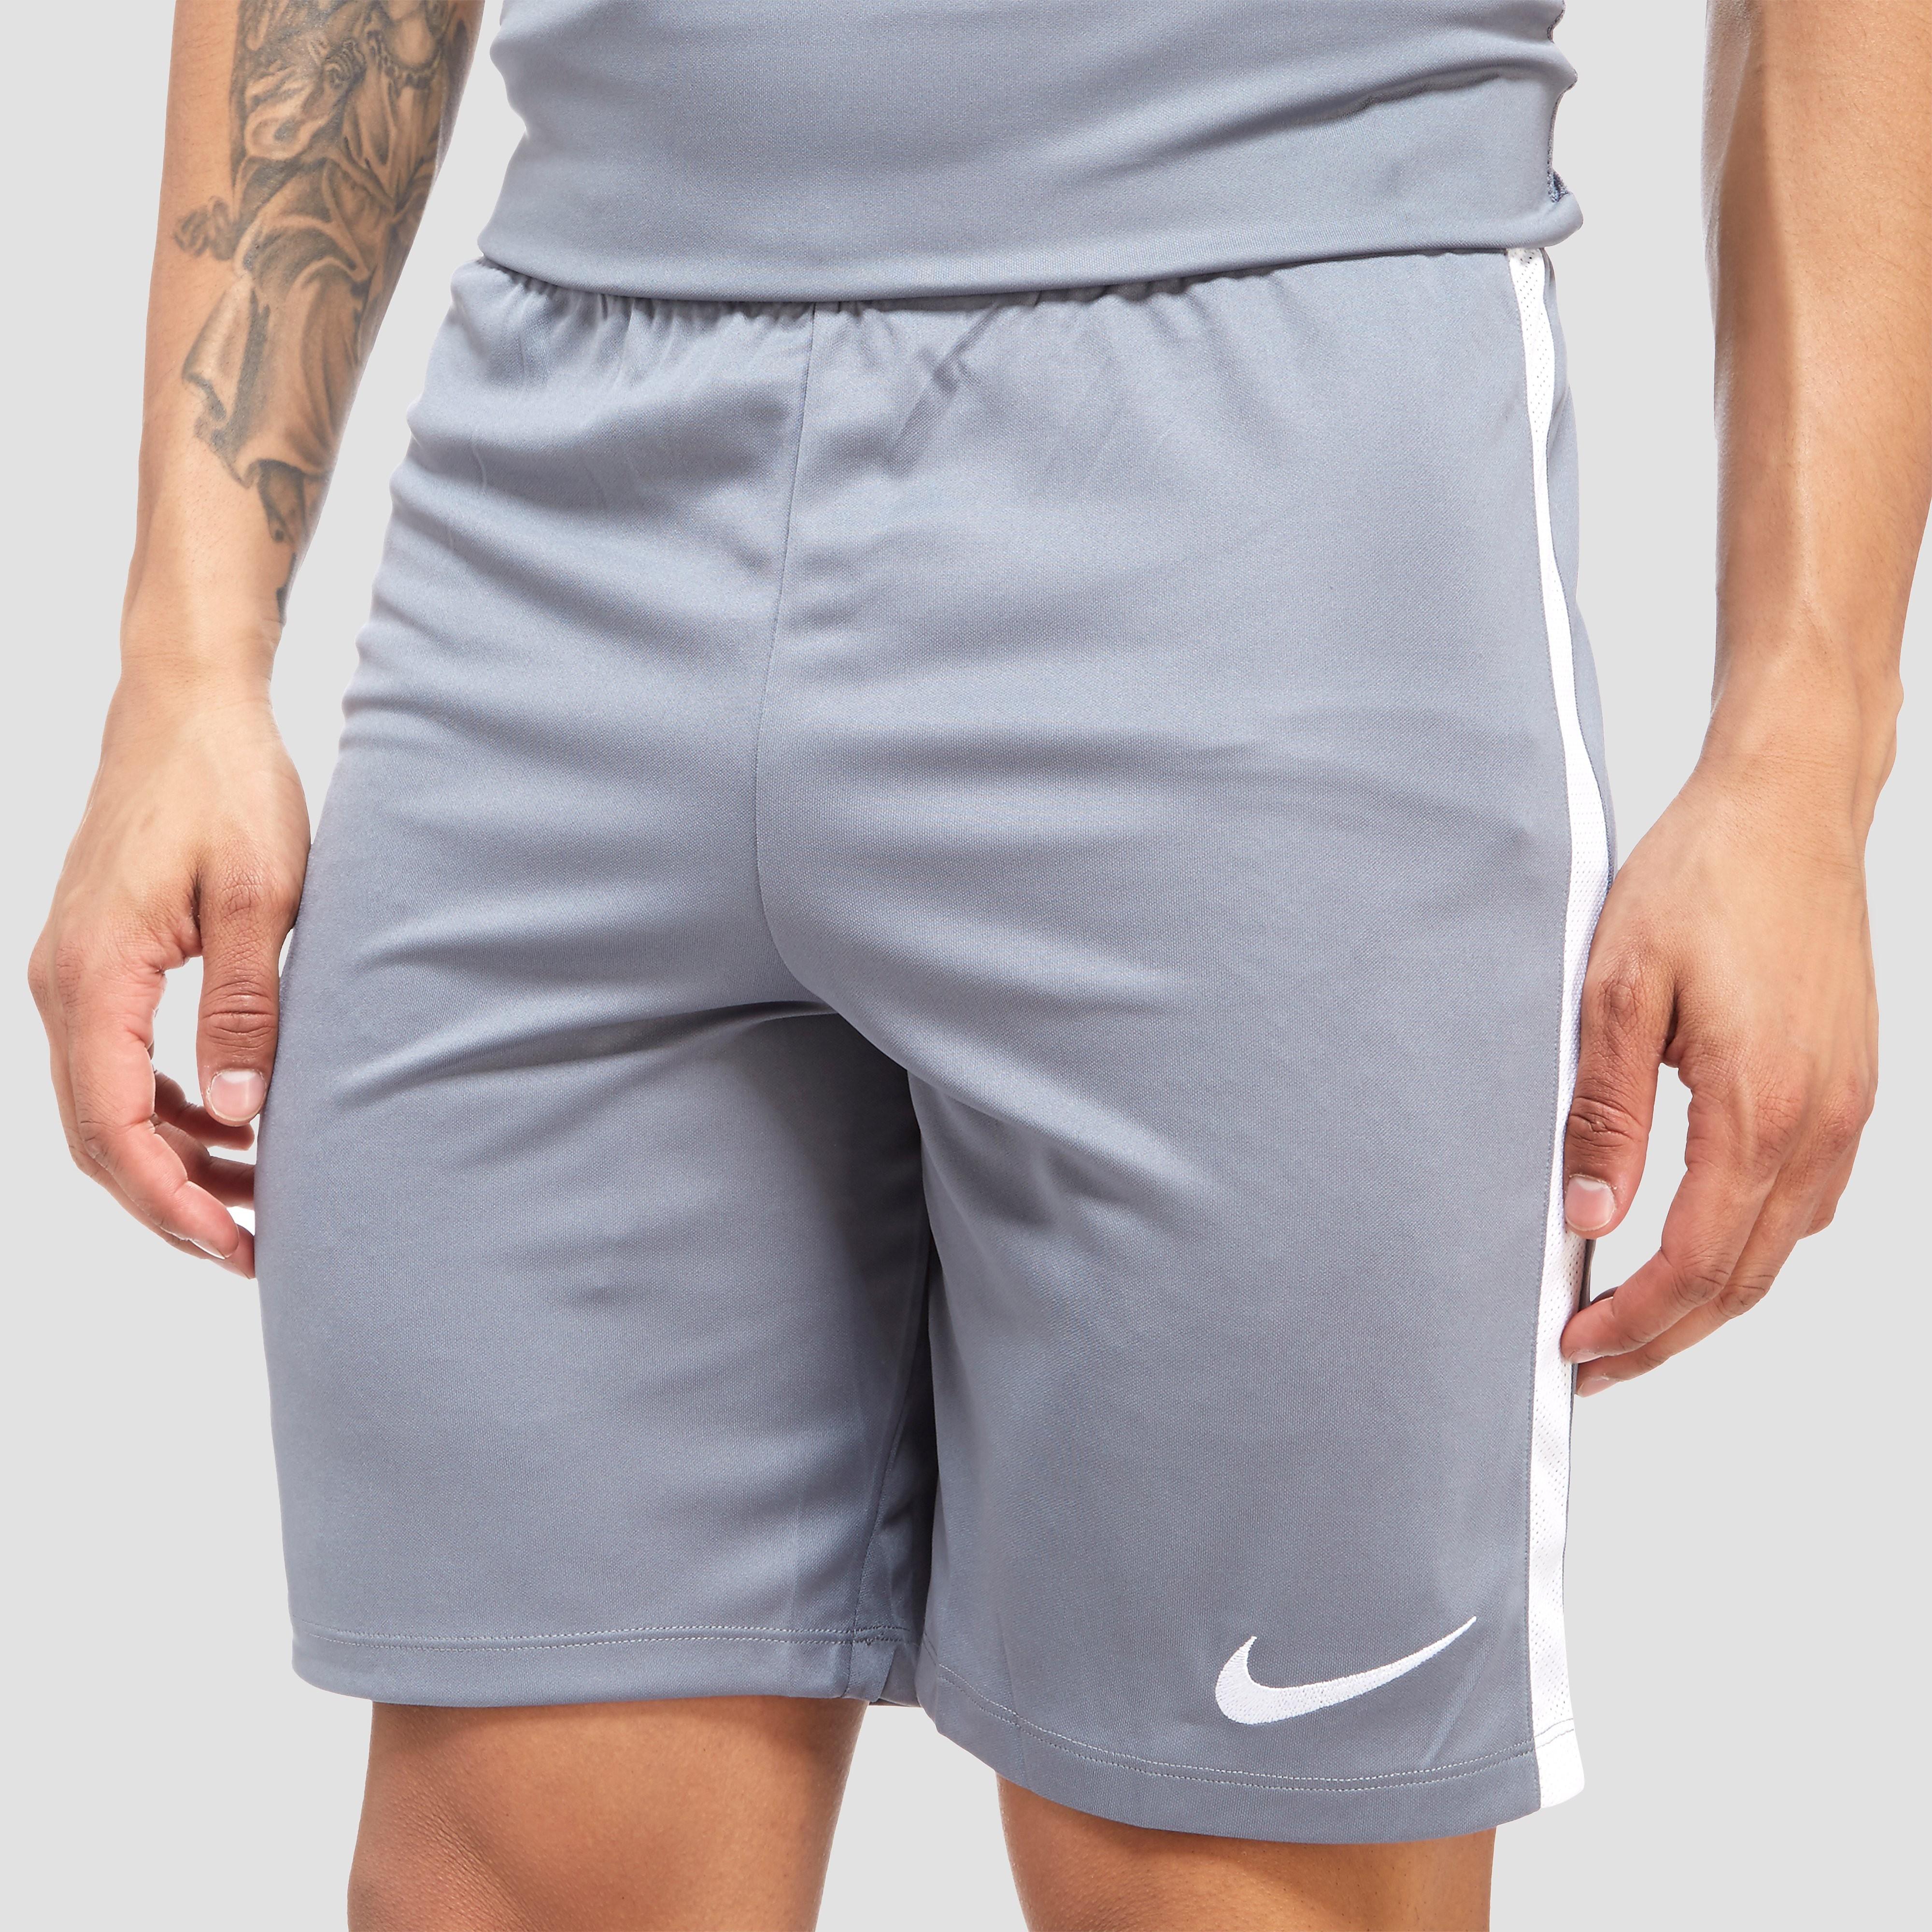 Nike Men's Academy 17 Shorts